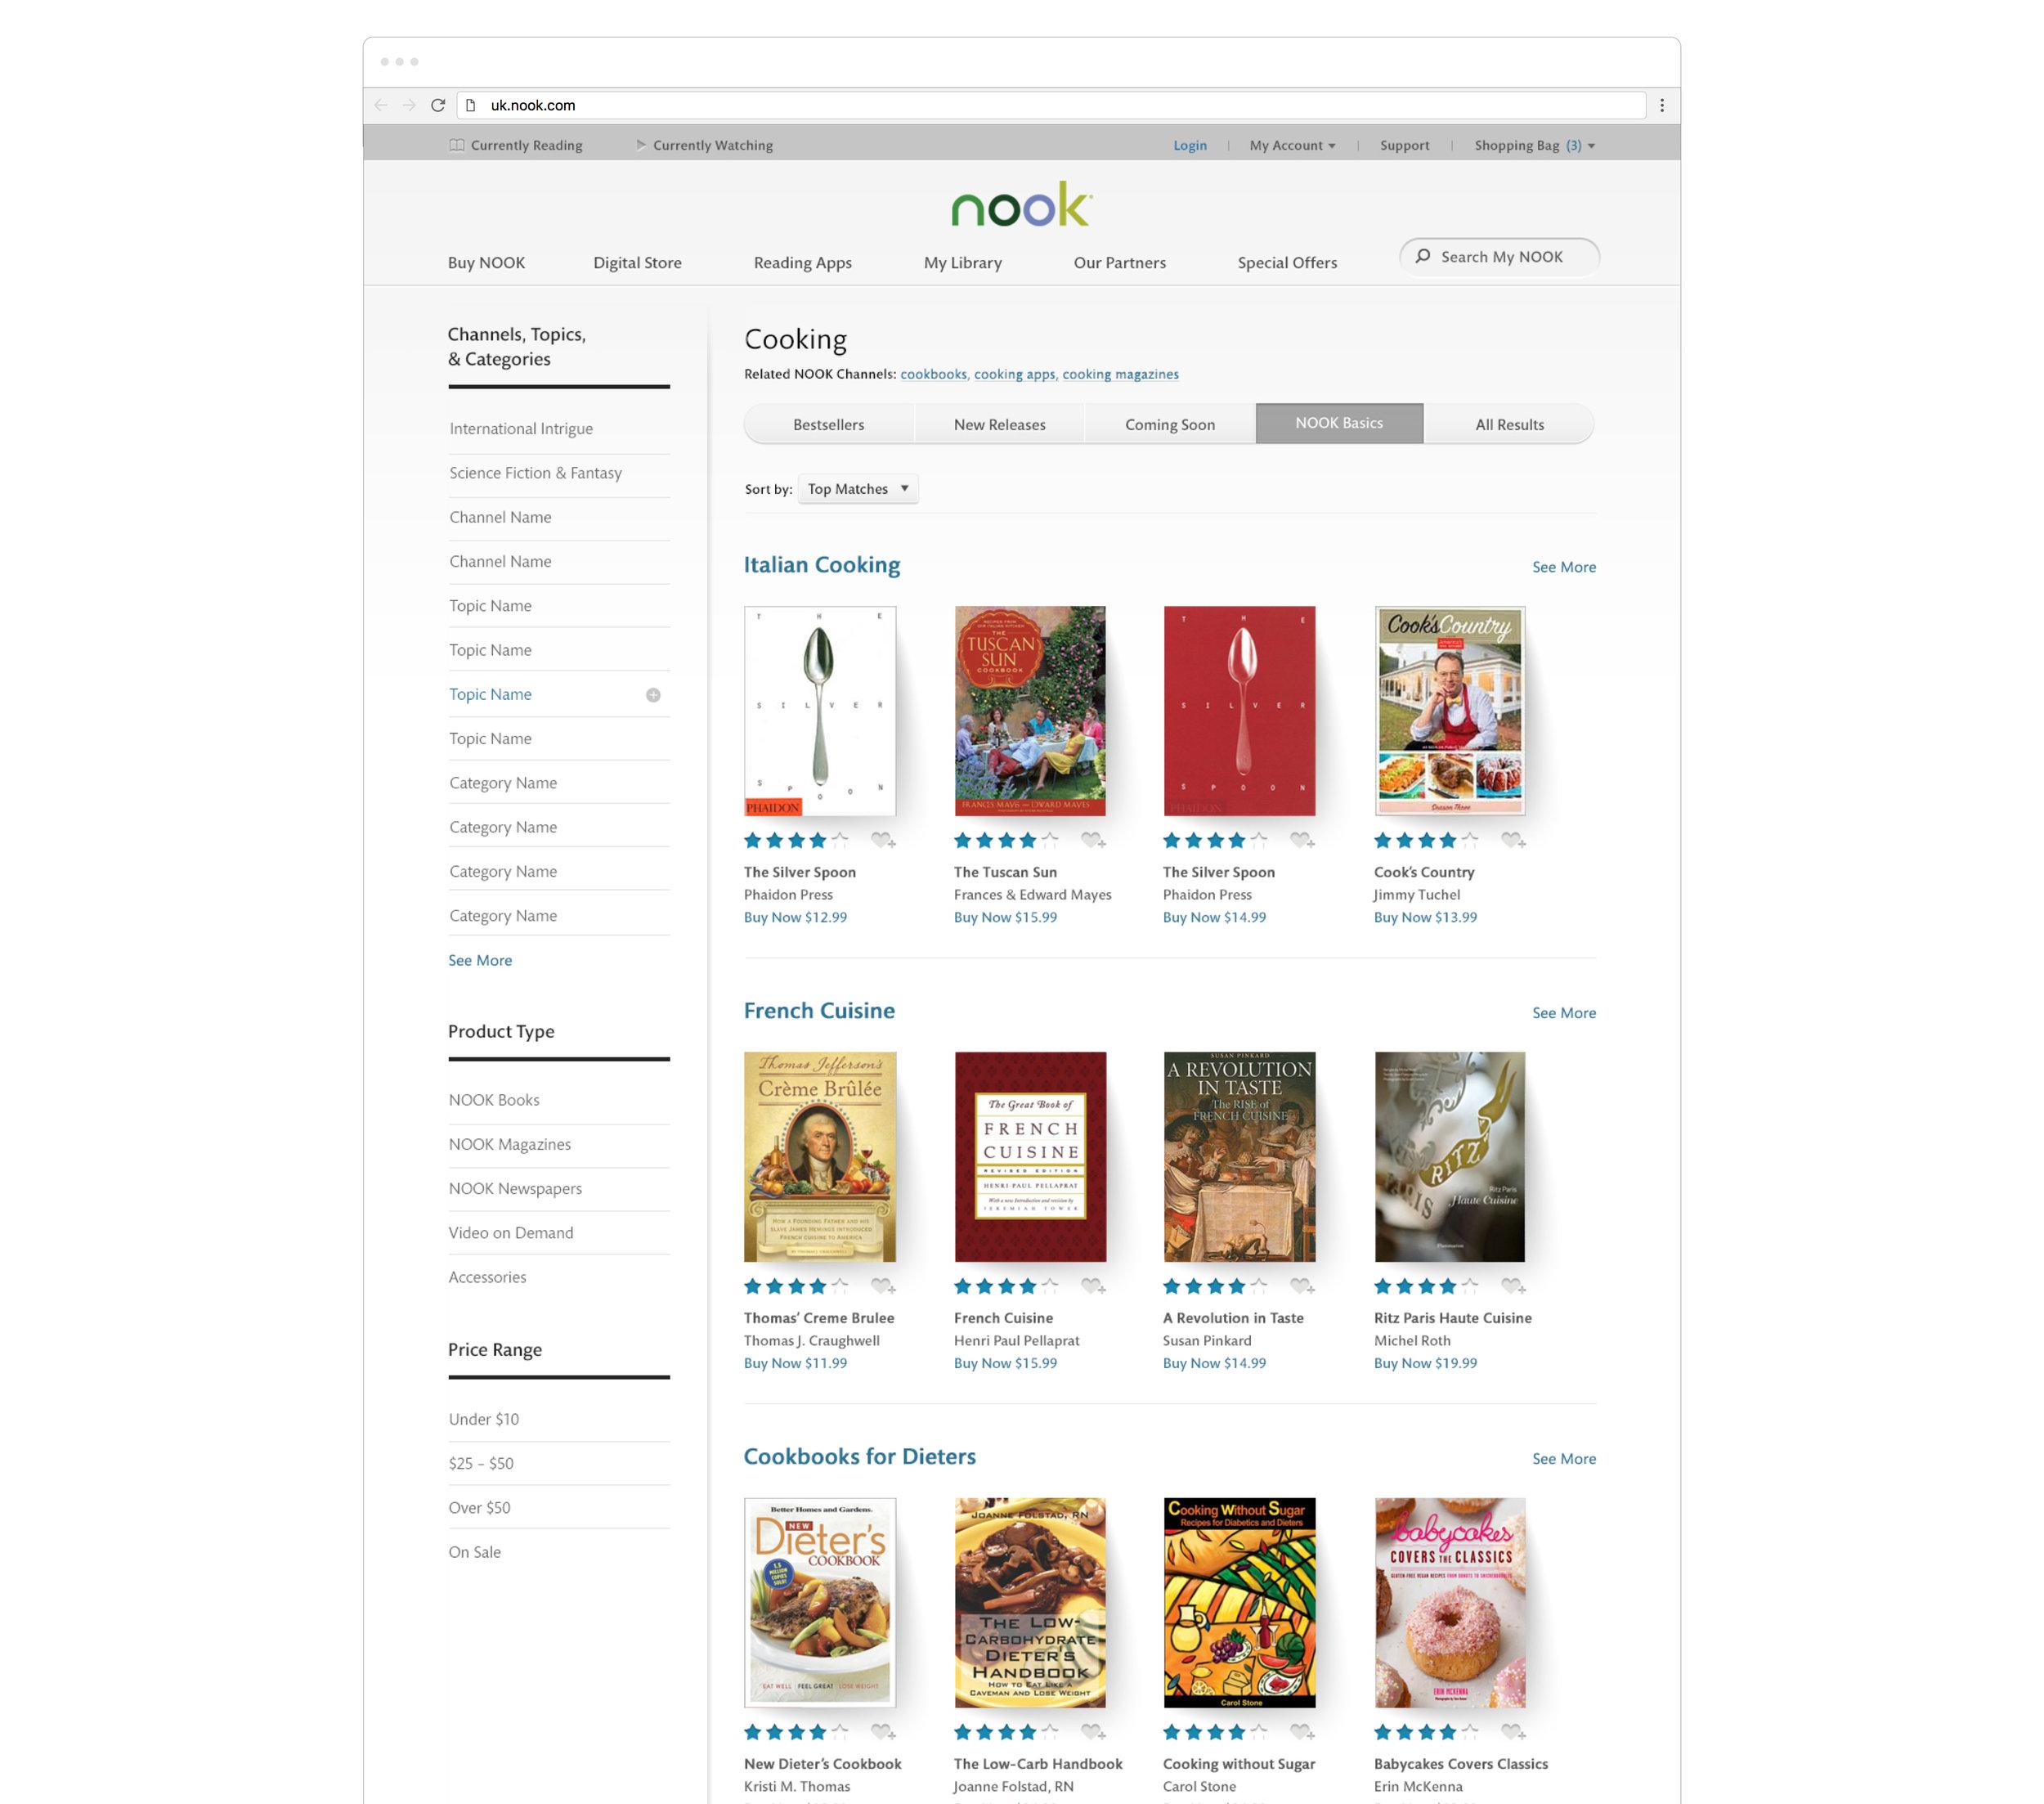 nook-uk-search.jpg